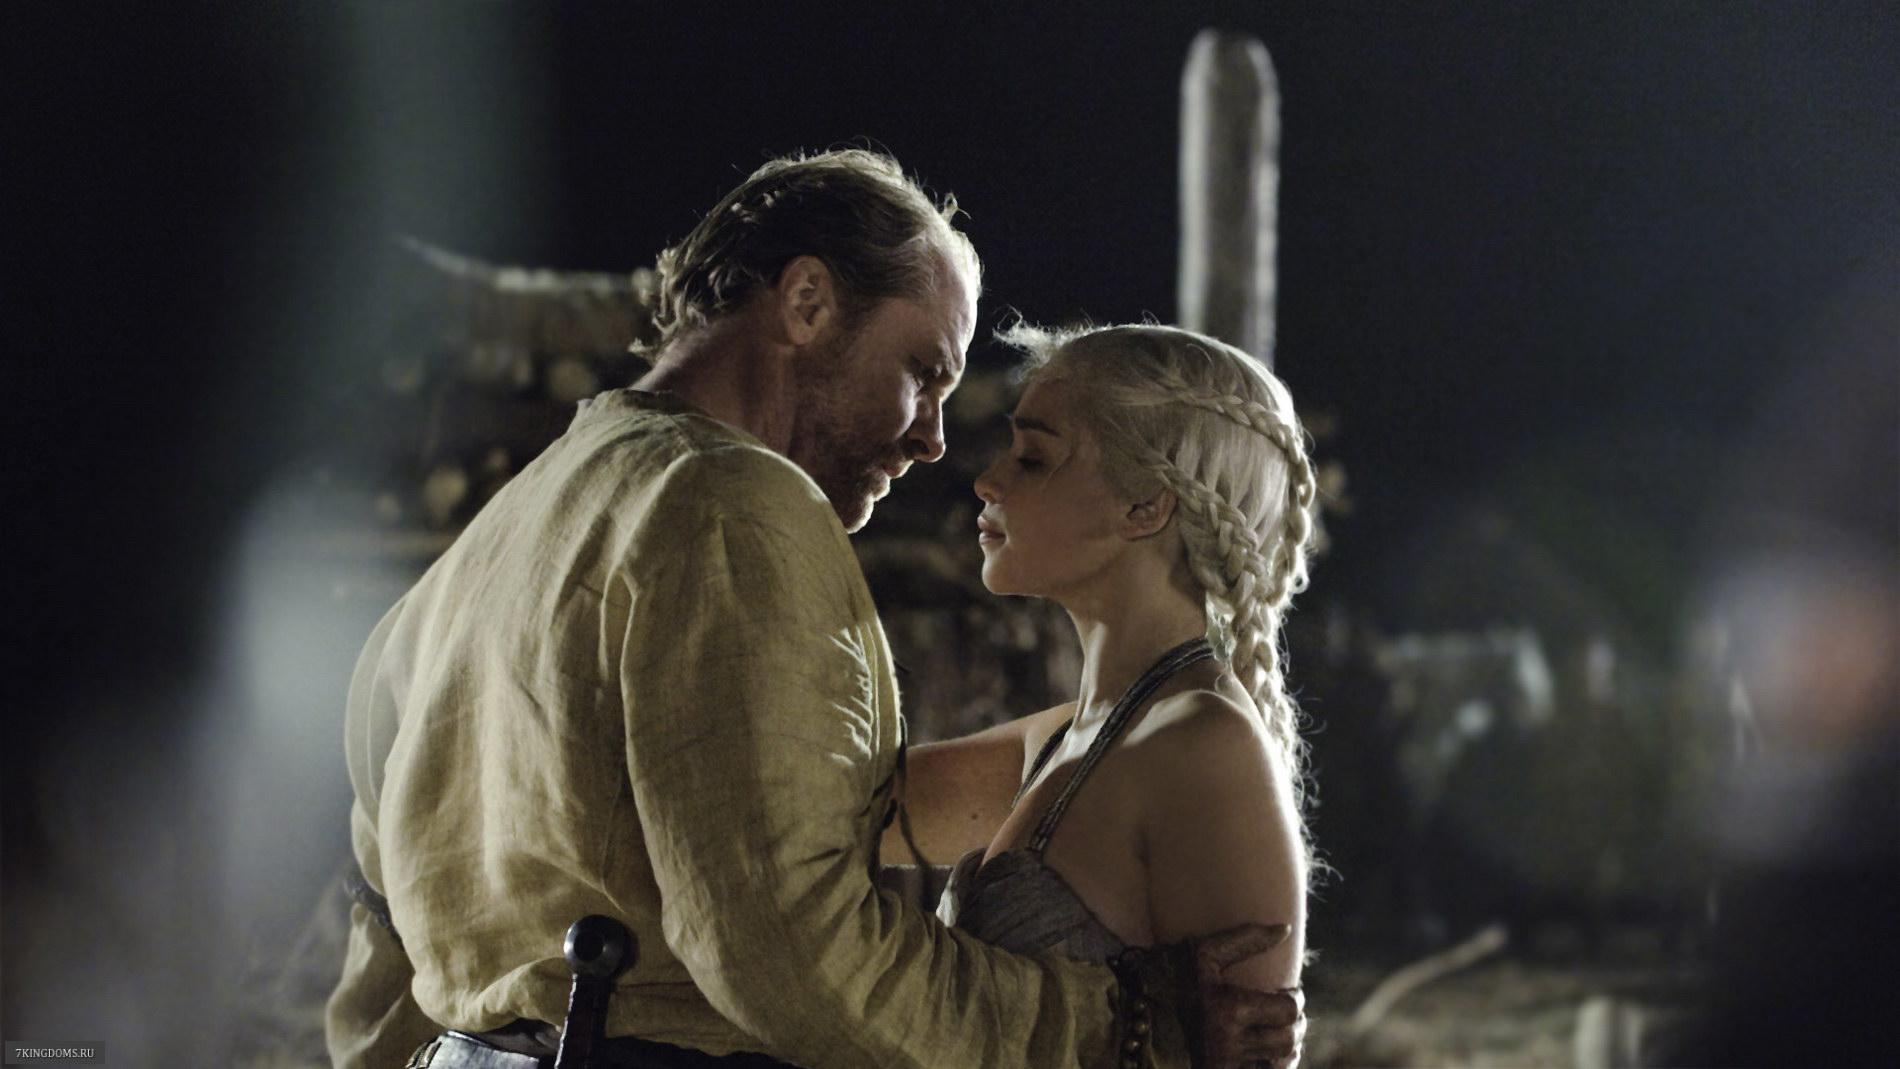 Daenerys & Jorah - Daenerys Targaryen Photo (23814723) - Fanpop